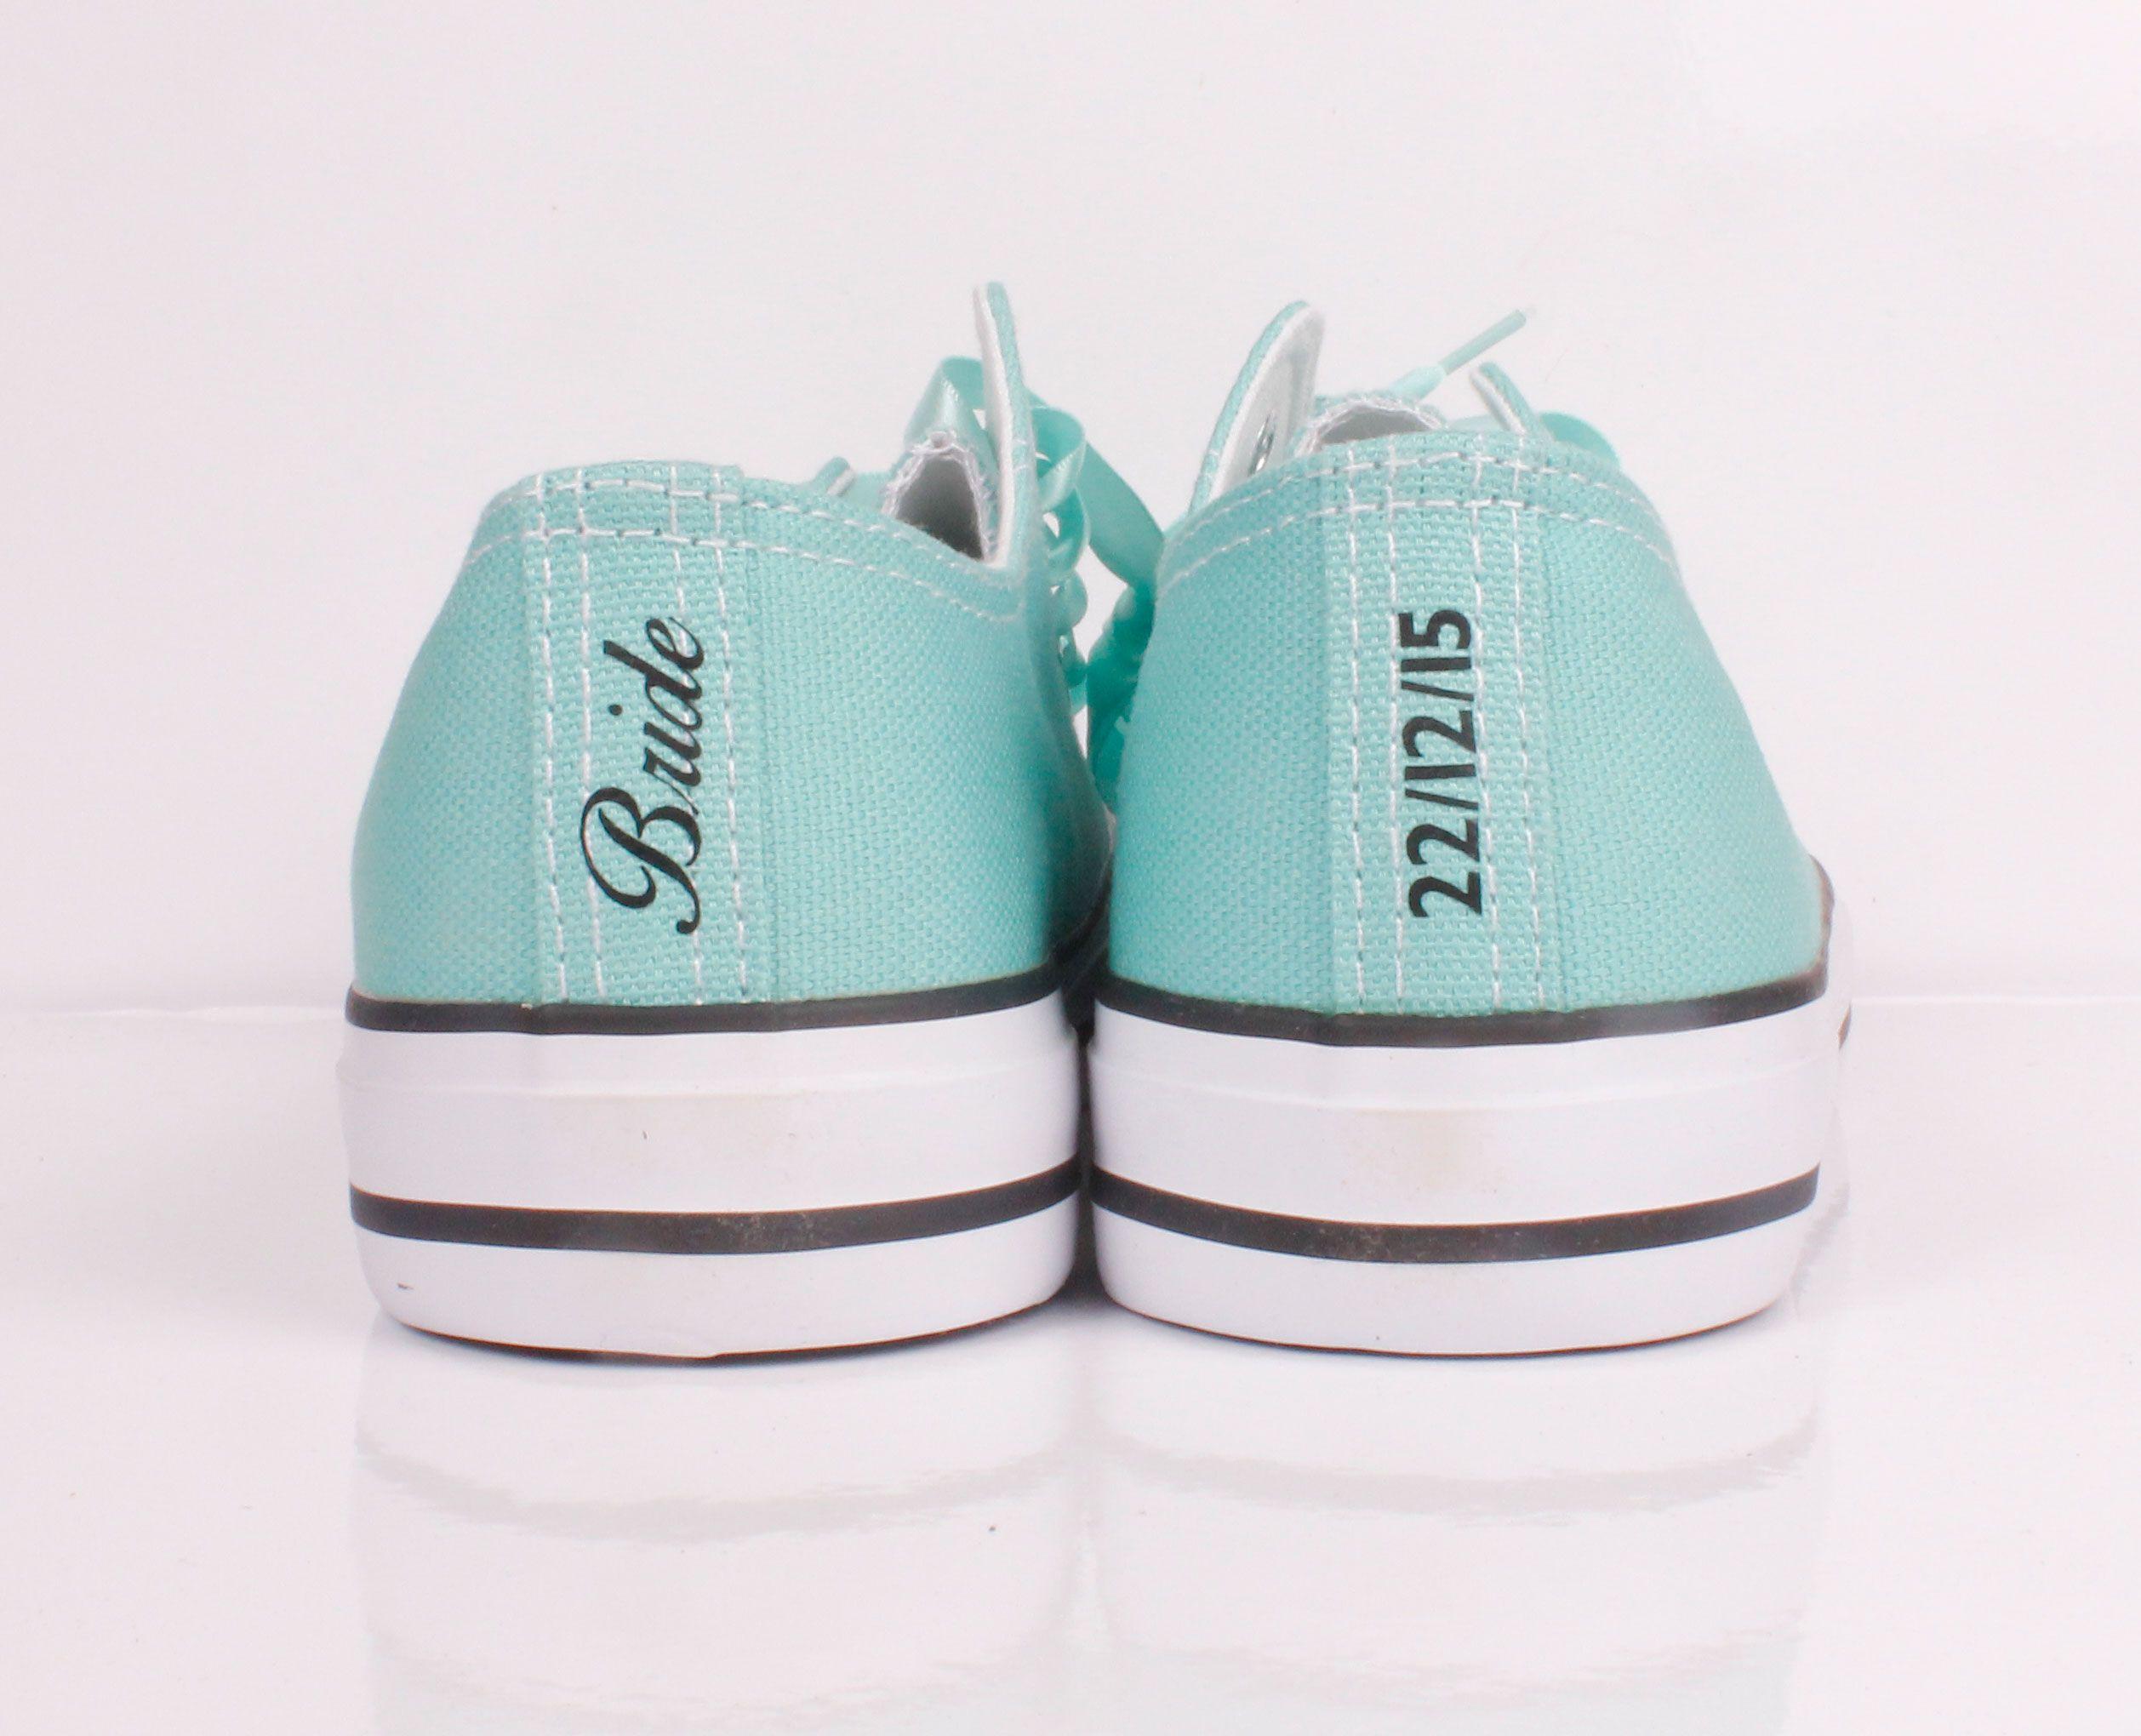 19036ae96c90 Tiffany blue Converse with Bride Heel Tag   Heel Stripe and Wedding Date